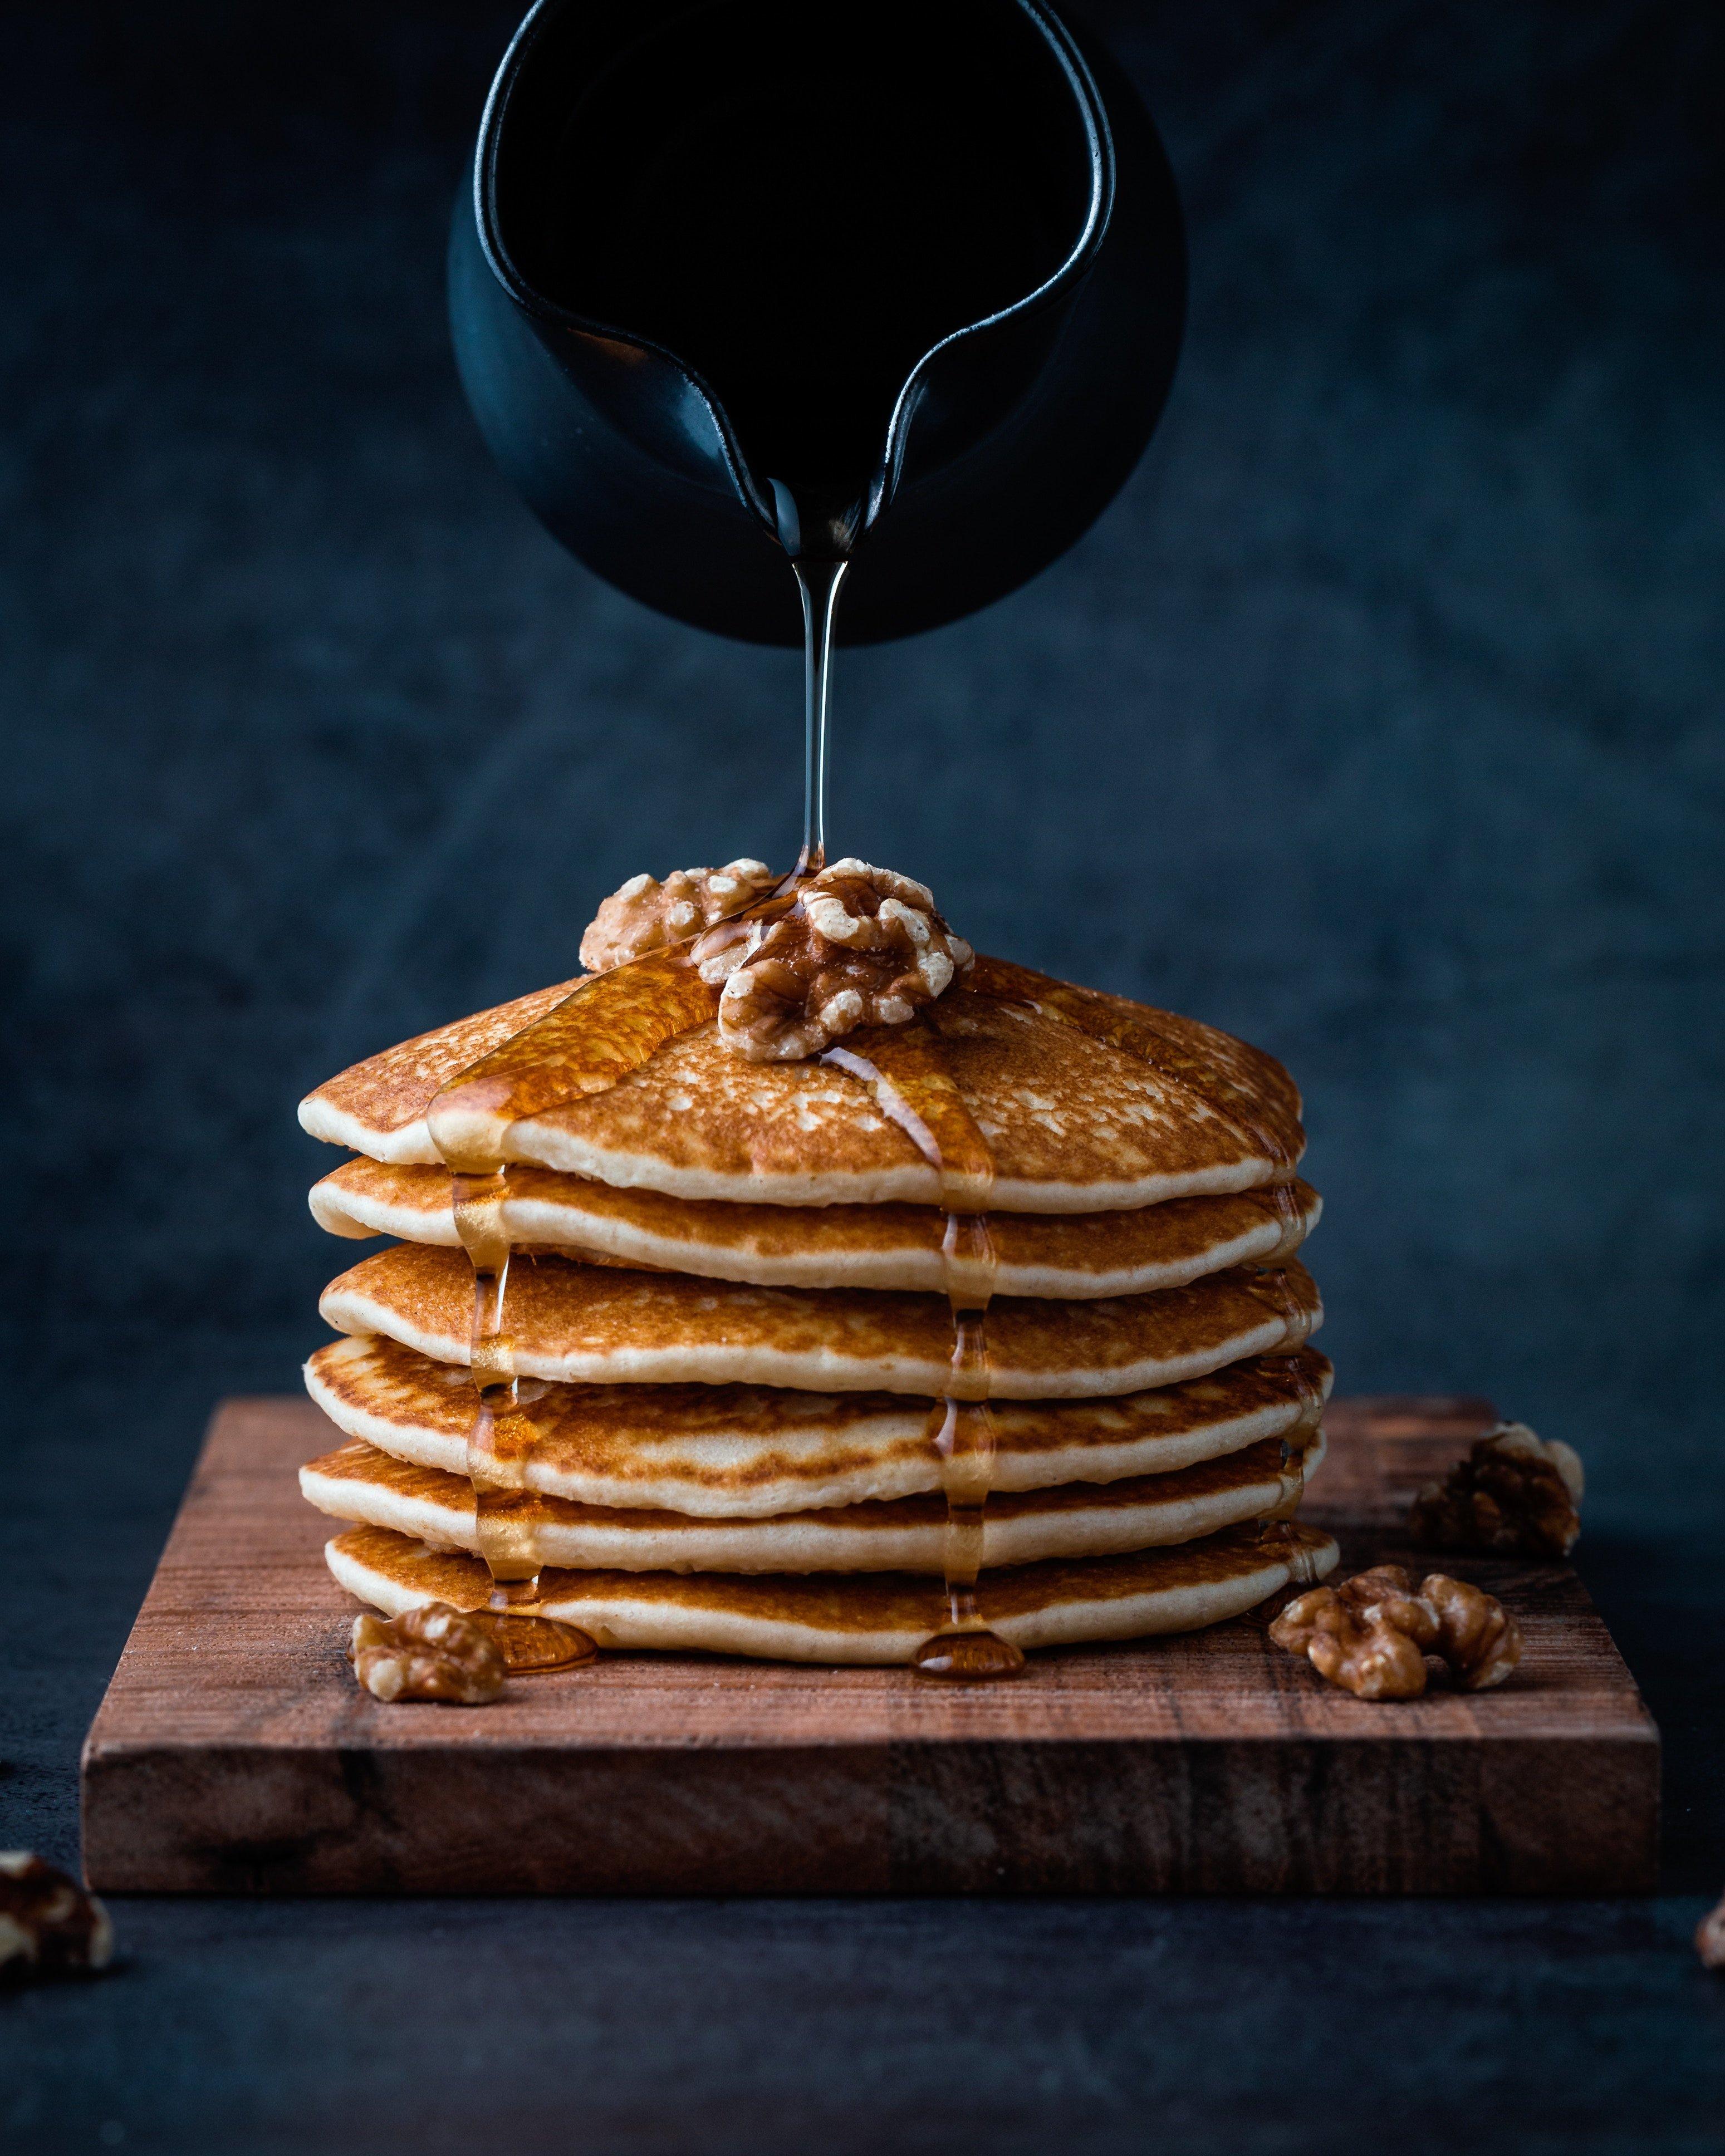 Gratis stockfoto website foodiesfeed.com_pouring-honey-on-pancakes-with-walnuts